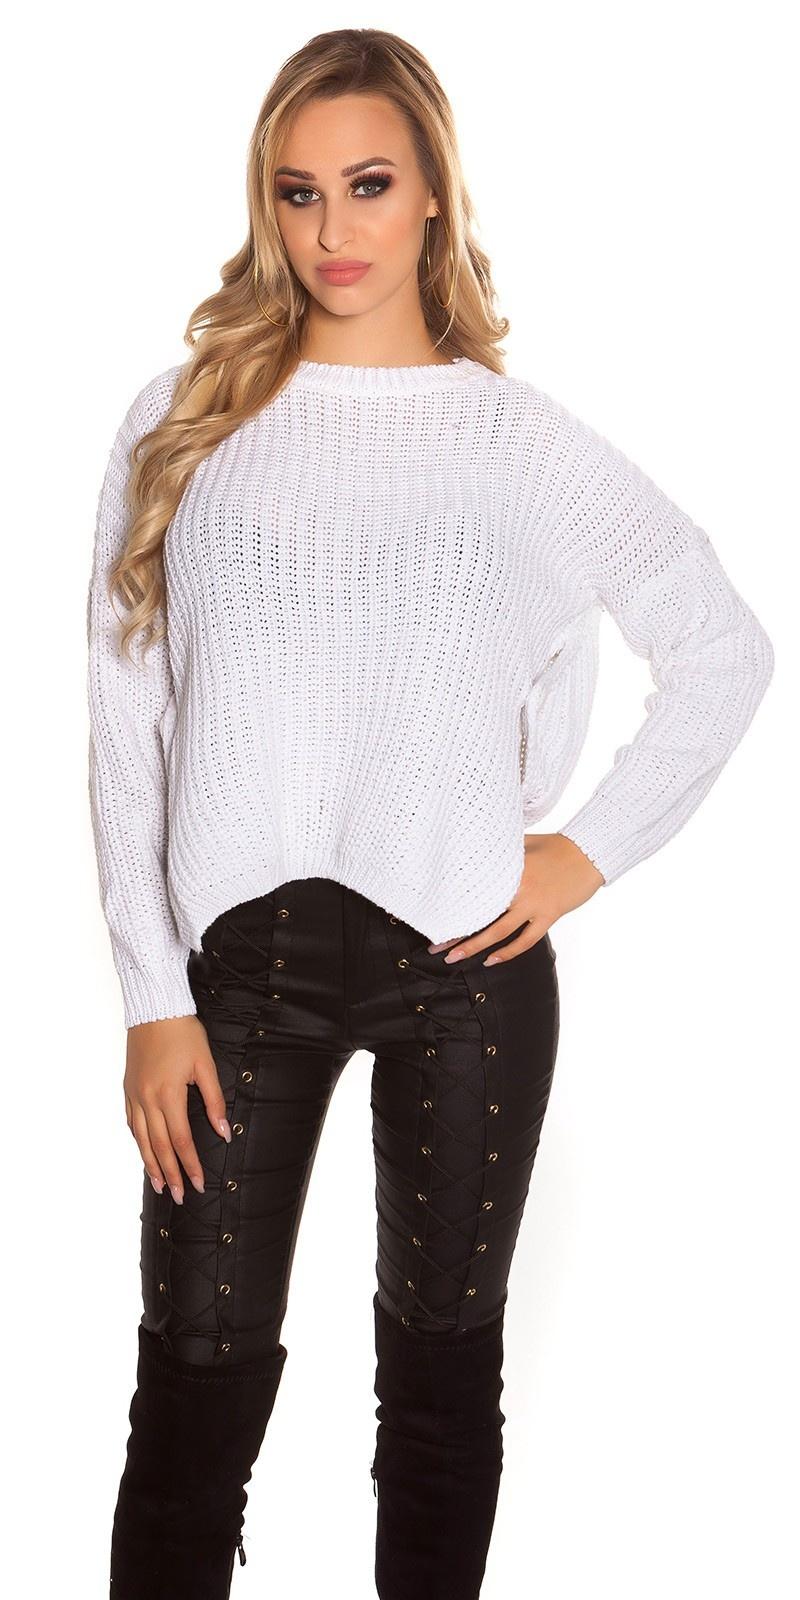 Trendy gebreide sweater-trui cremewit